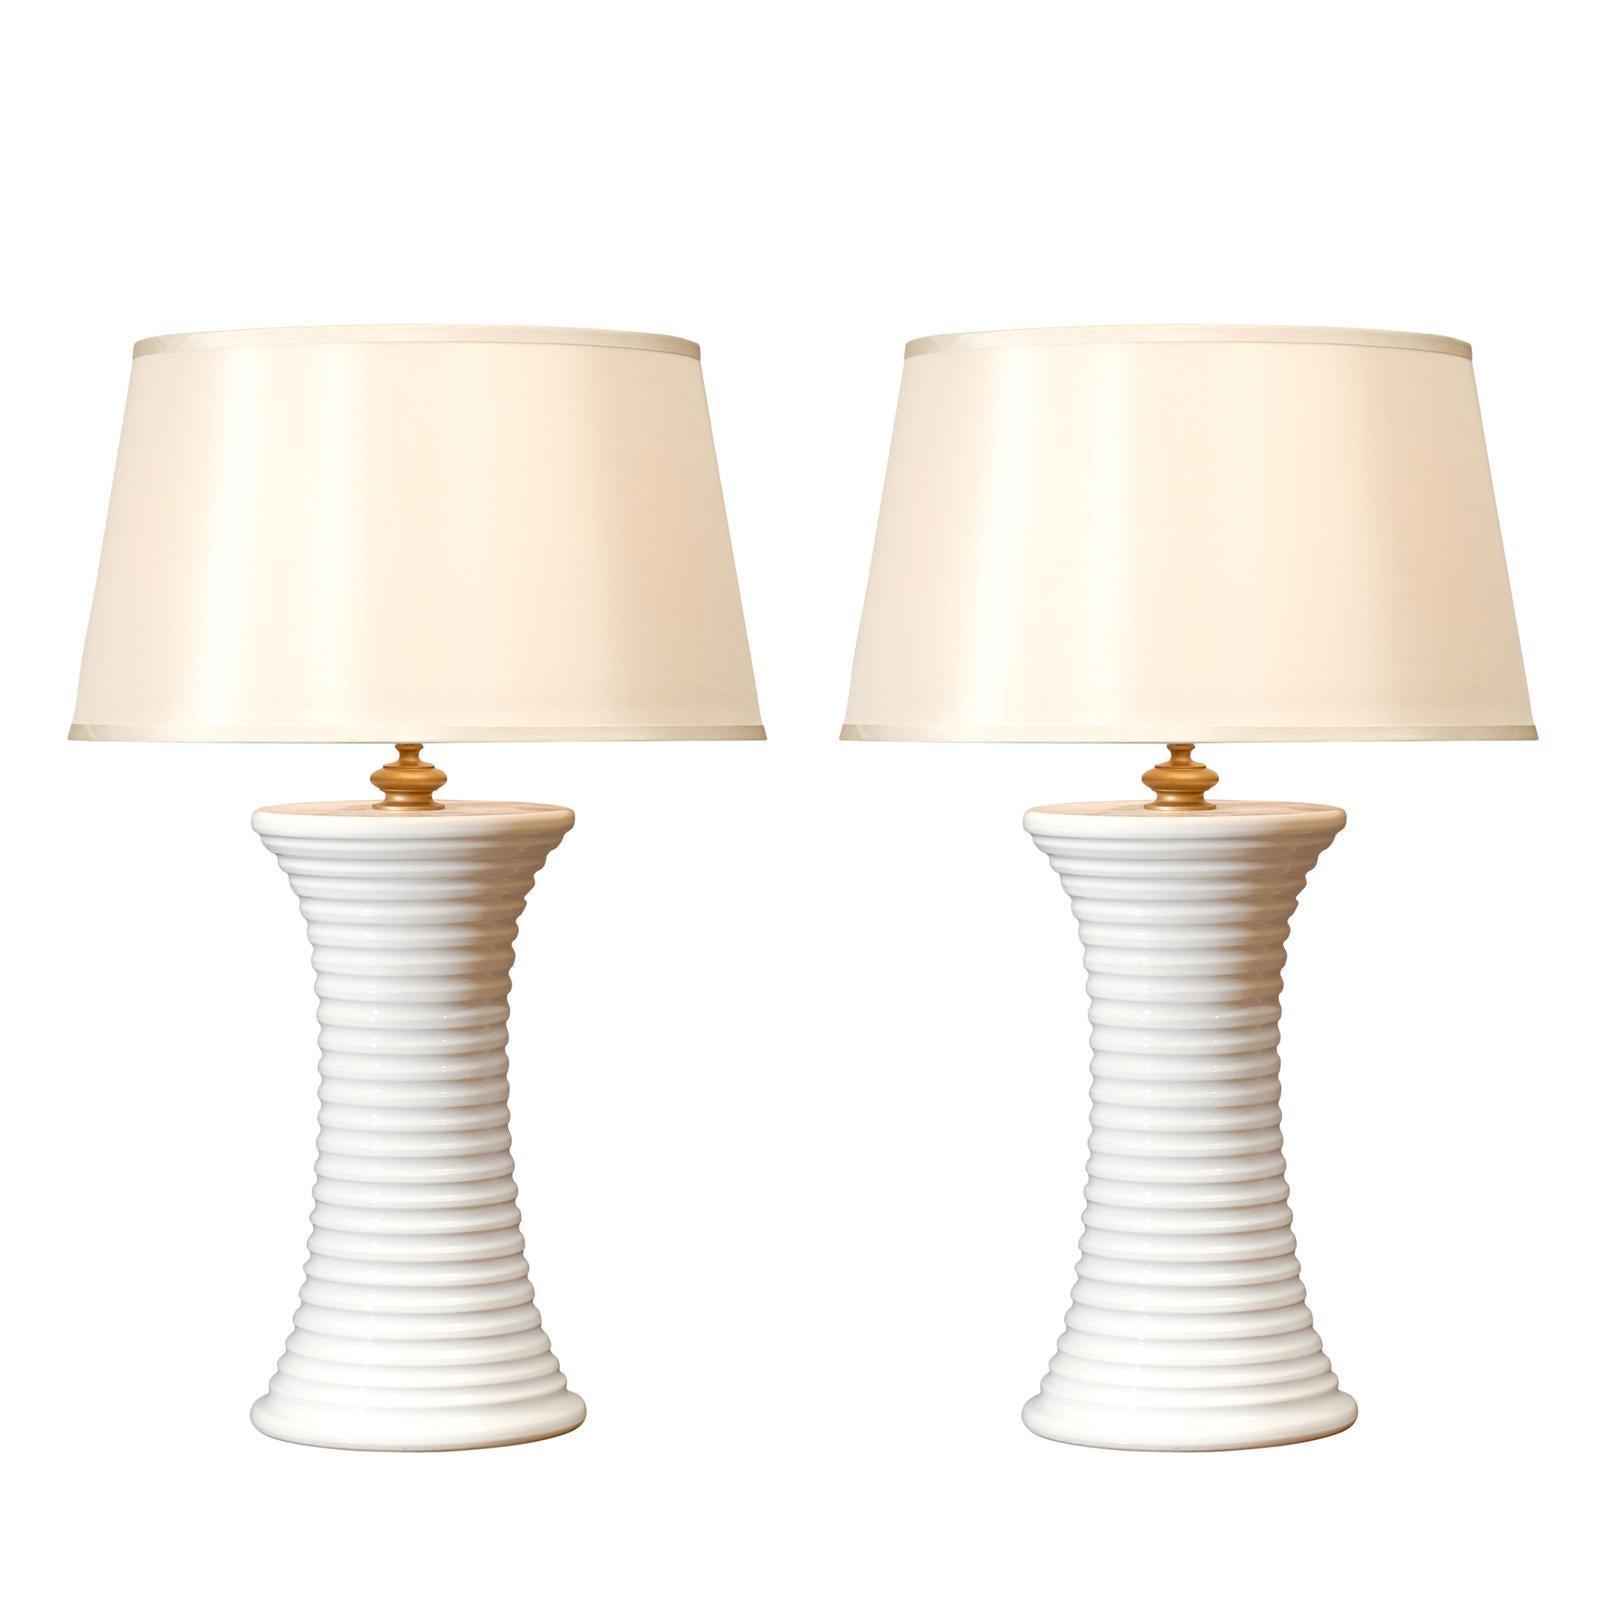 Wonderful Pair of Large Scale Vintage Ceramic Lamps